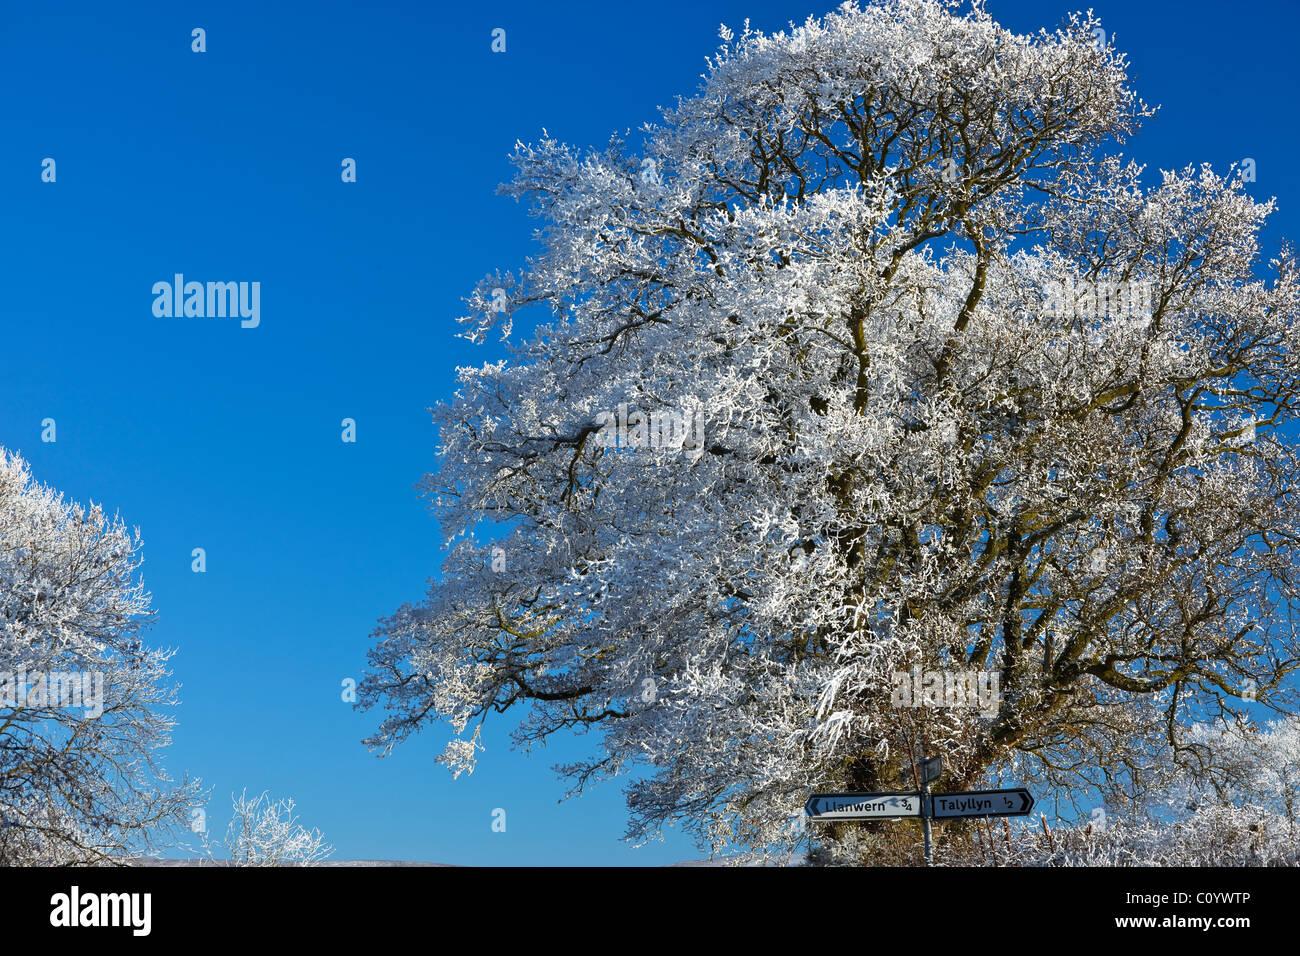 Baumkronen Brecon Beacons Powys Wales im winter Stockbild